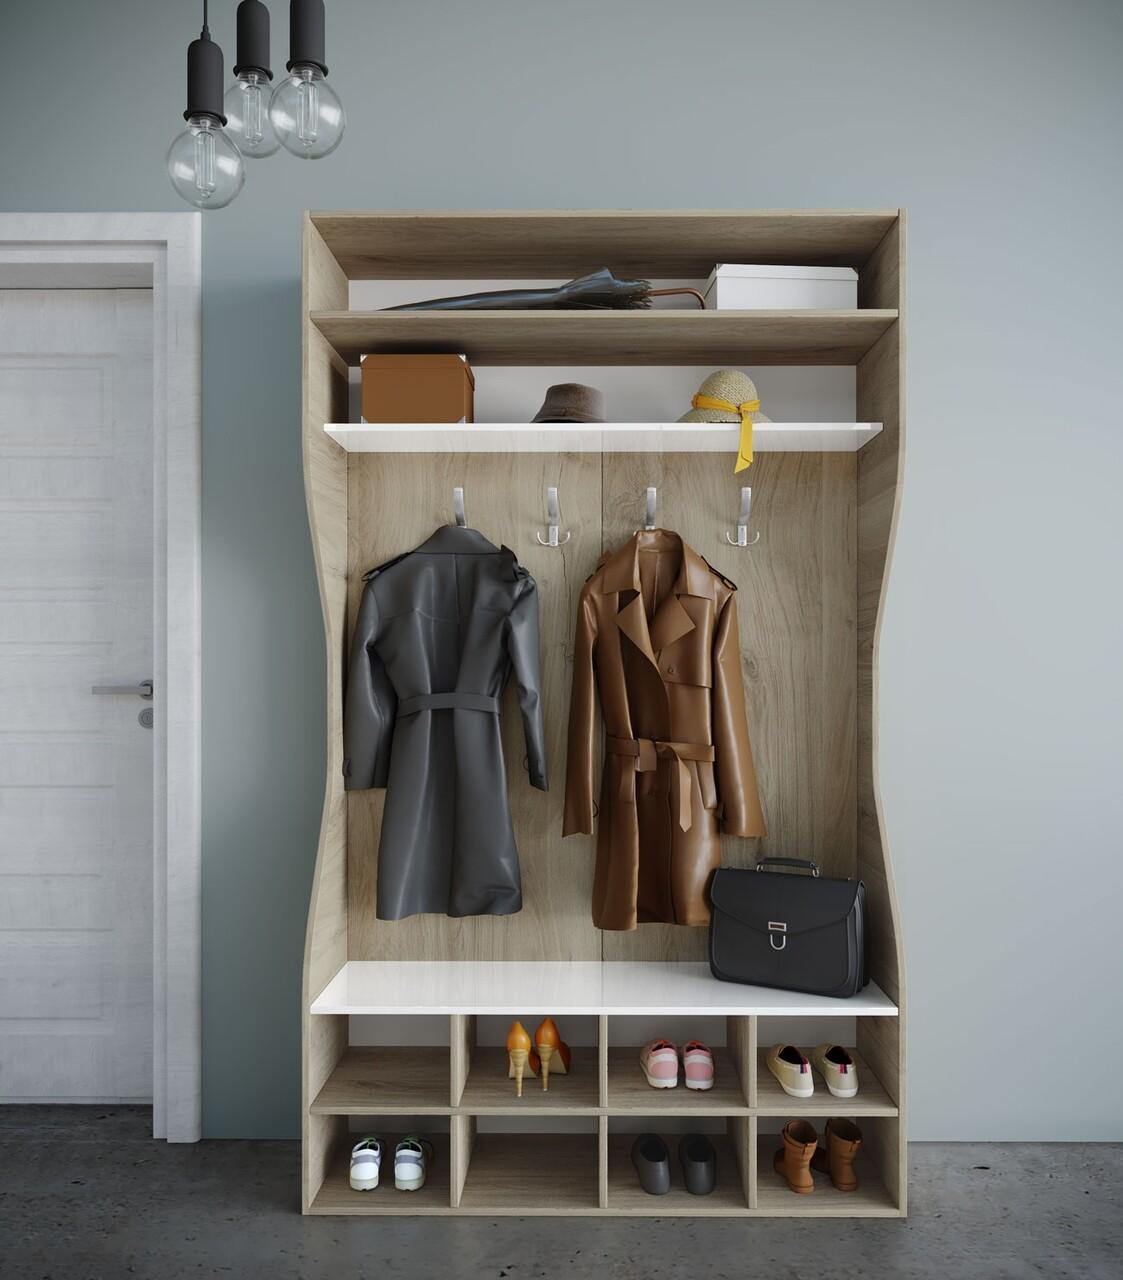 Cuier cu 2 rafturi si pantofar, Bedora, City 4056, 120 x 37 x 201 cm, PAL, stejar/alb